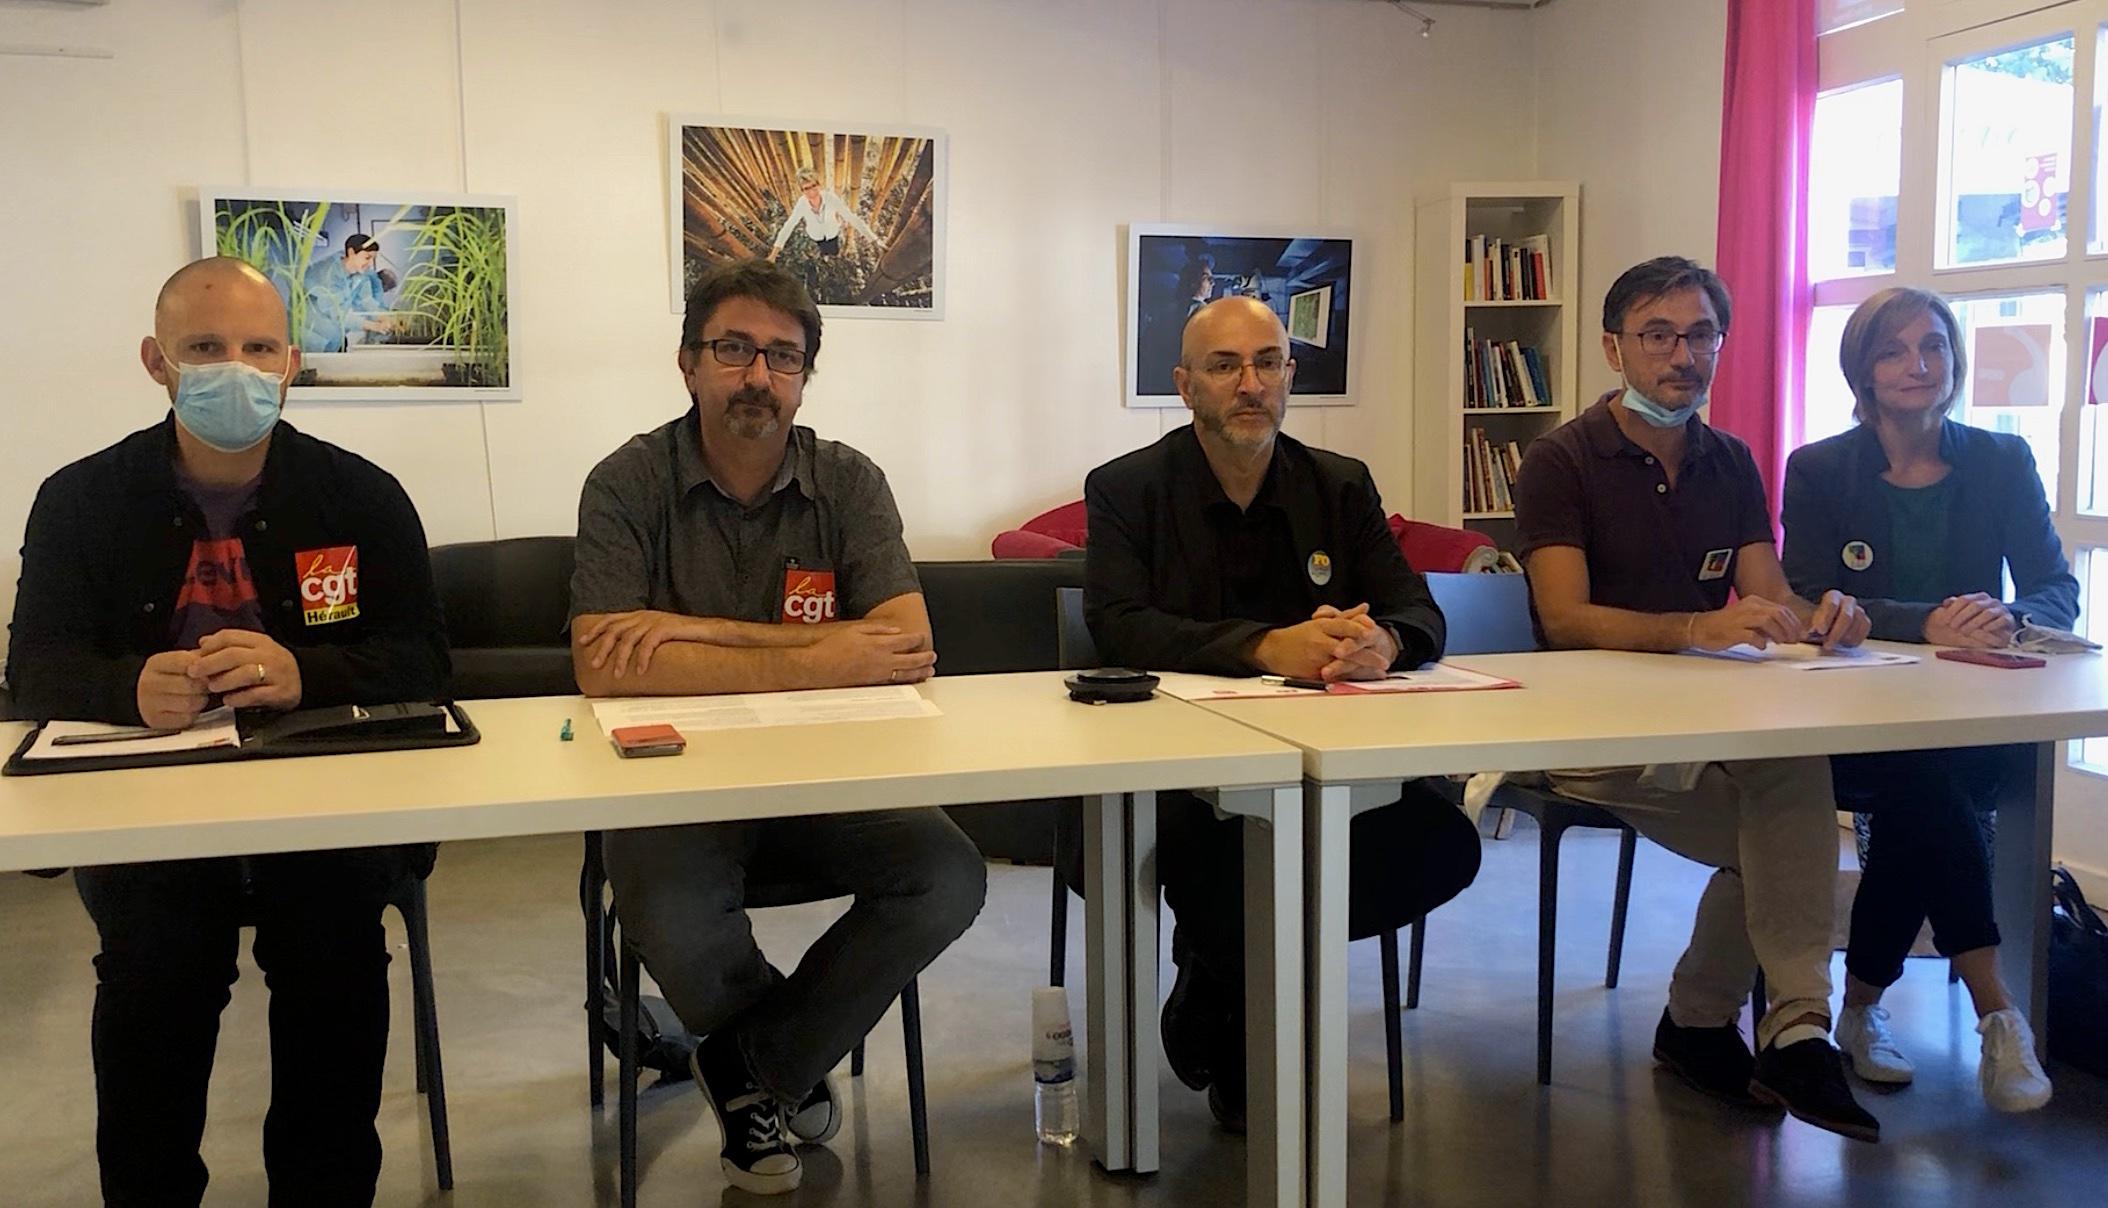 Conférence de presse CGT, FO FSU Septembre 2021 (©JPV)